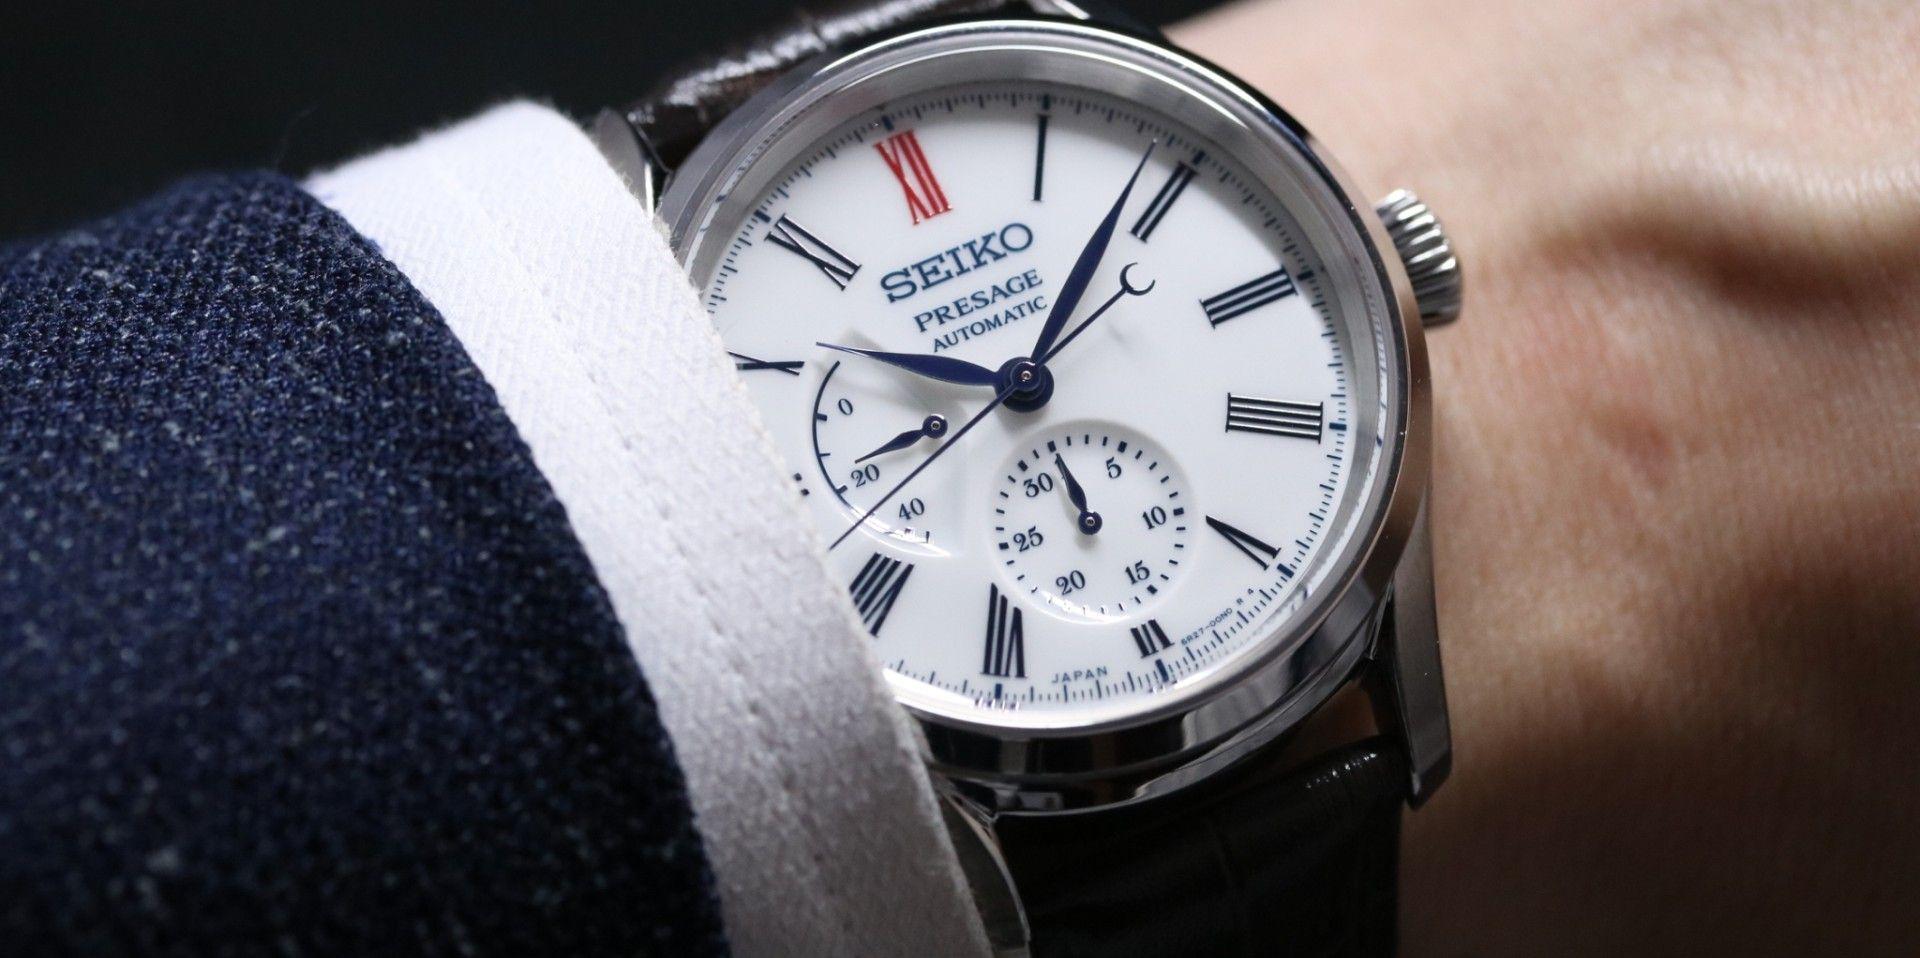 【2019 BASEL錶展報導】美麗的青花瓷:SEIKO Presage有田燒陶瓷錶盤腕錶